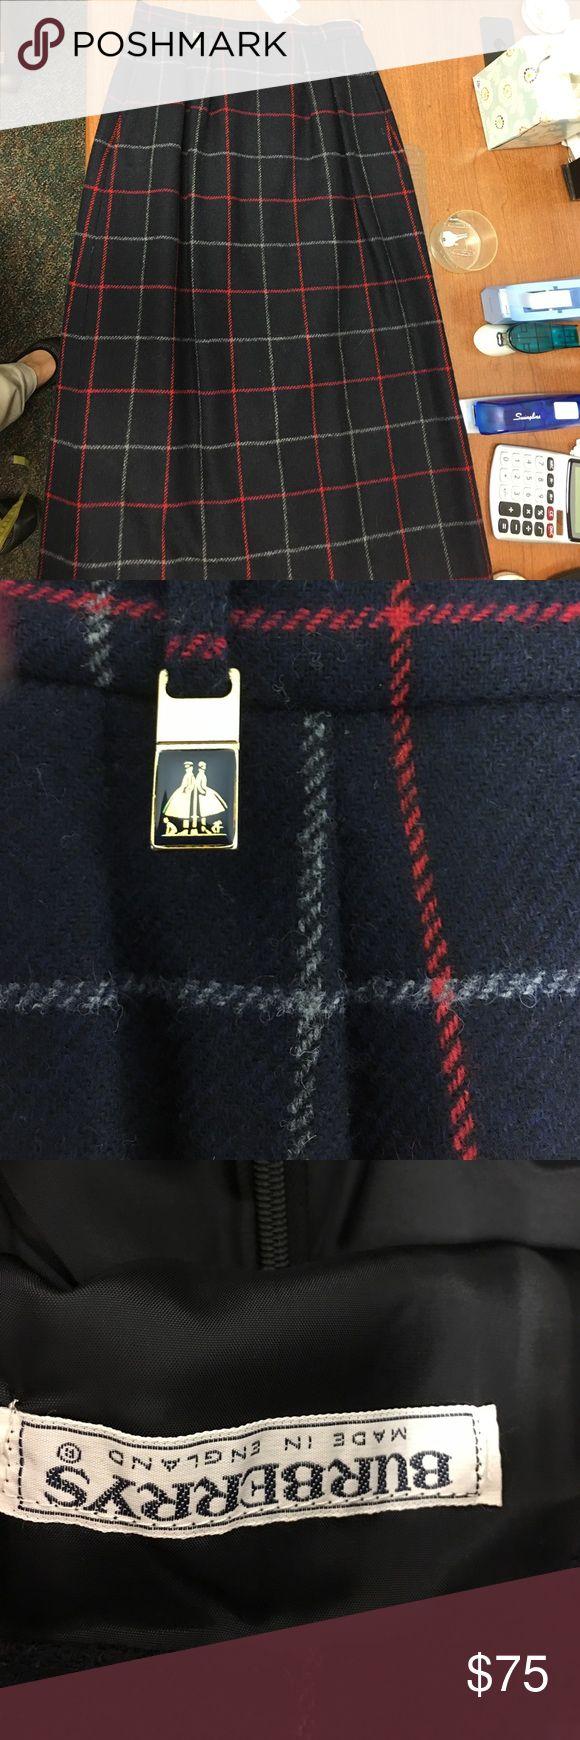 "Vintage Burberry skirt 24"" waist 27.25 length plus 1"" waist band Burberry Skirts Midi"